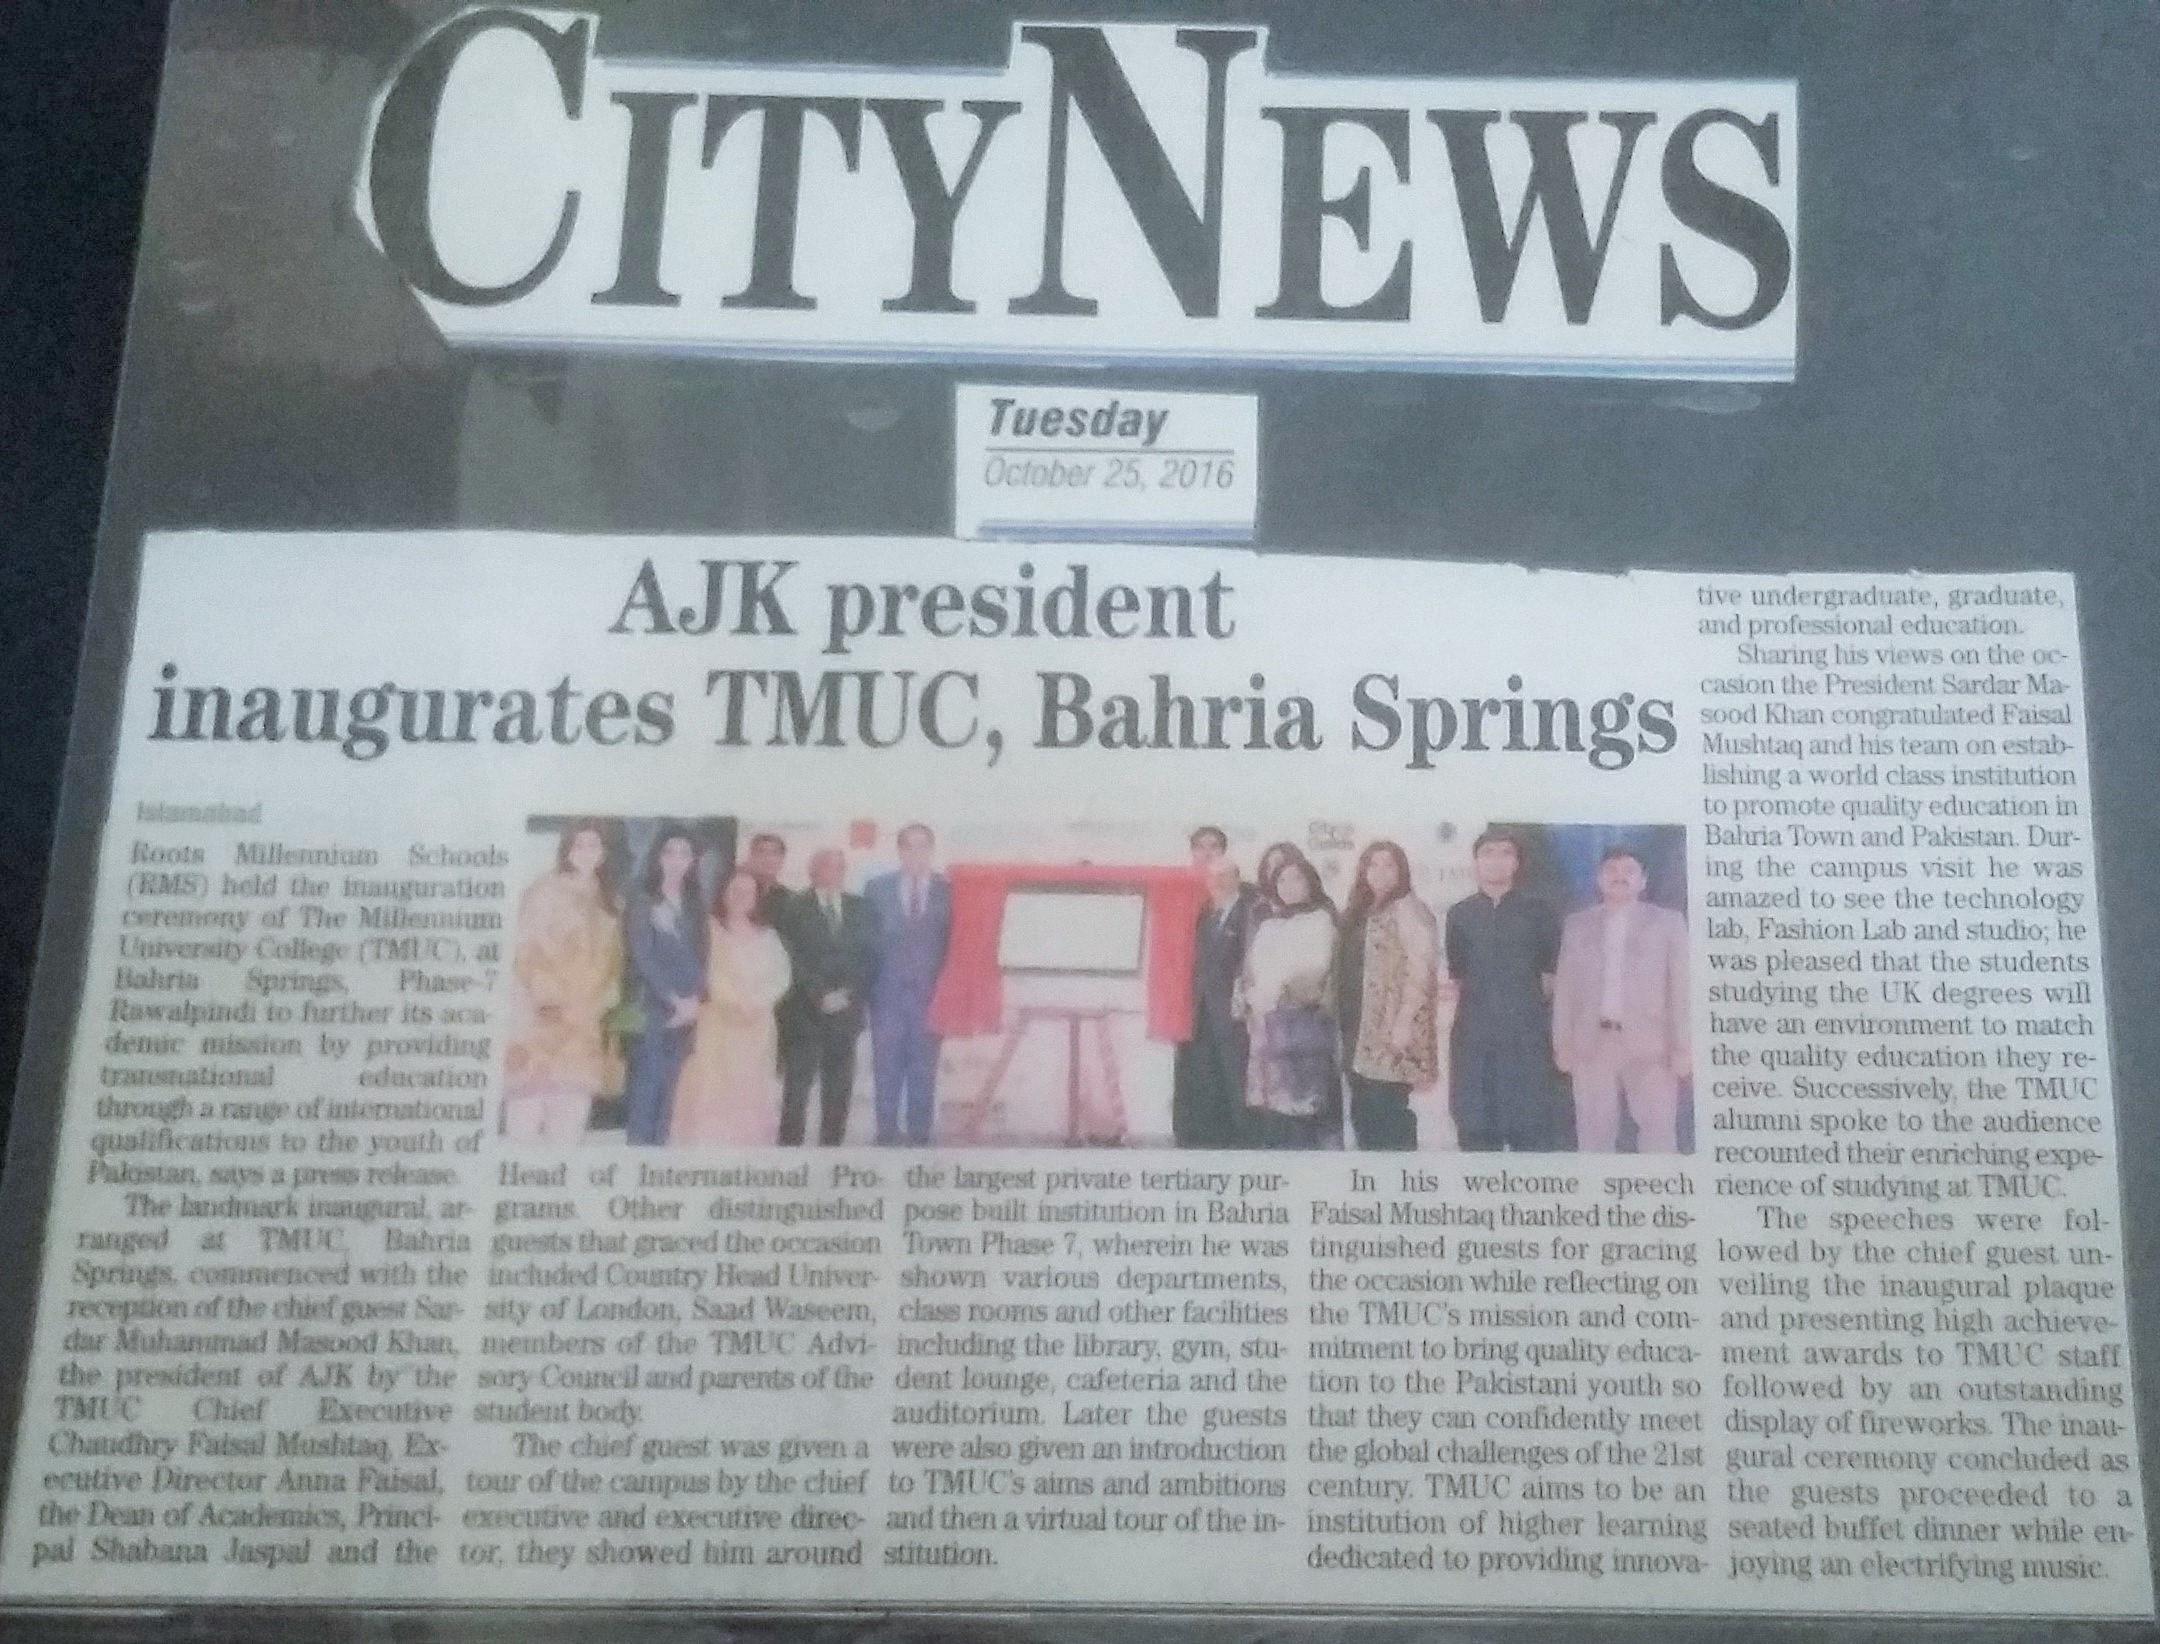 AJK President inaugurates TMUC Bahria Springs